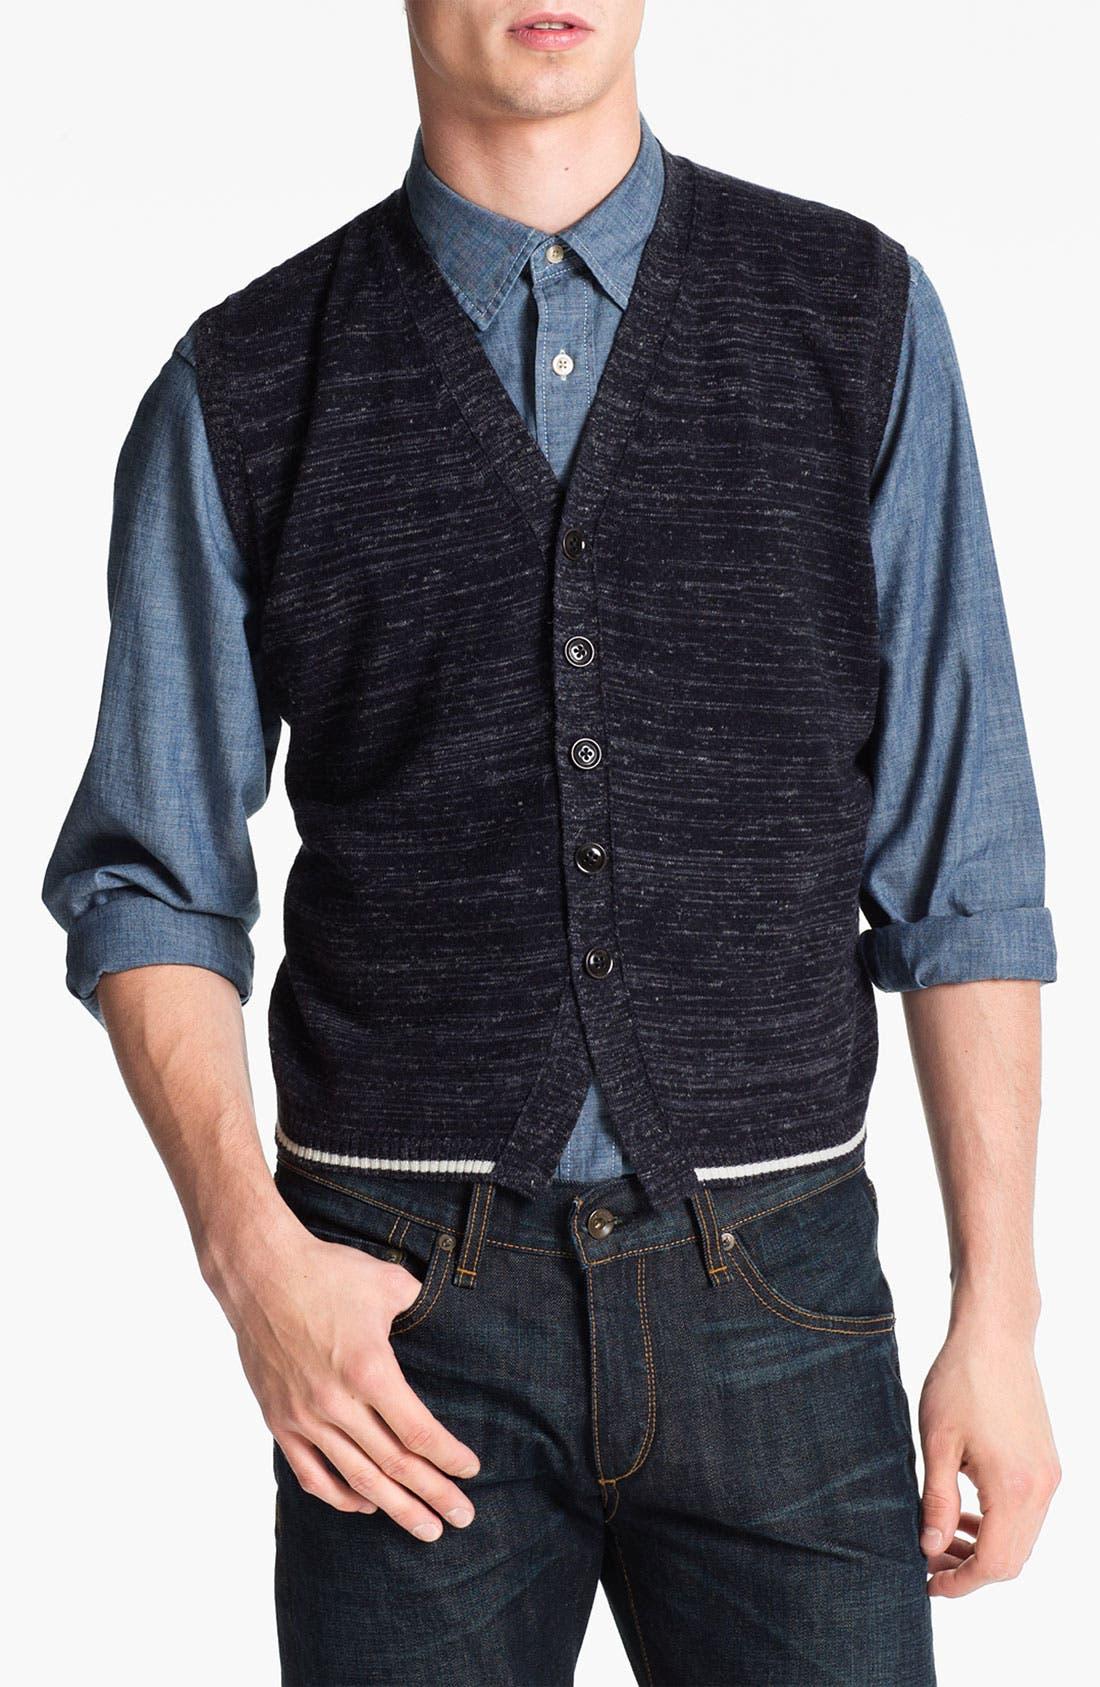 Alternate Image 1 Selected - Orlandini 'Nis' Merino Wool Blend Sweater Vest